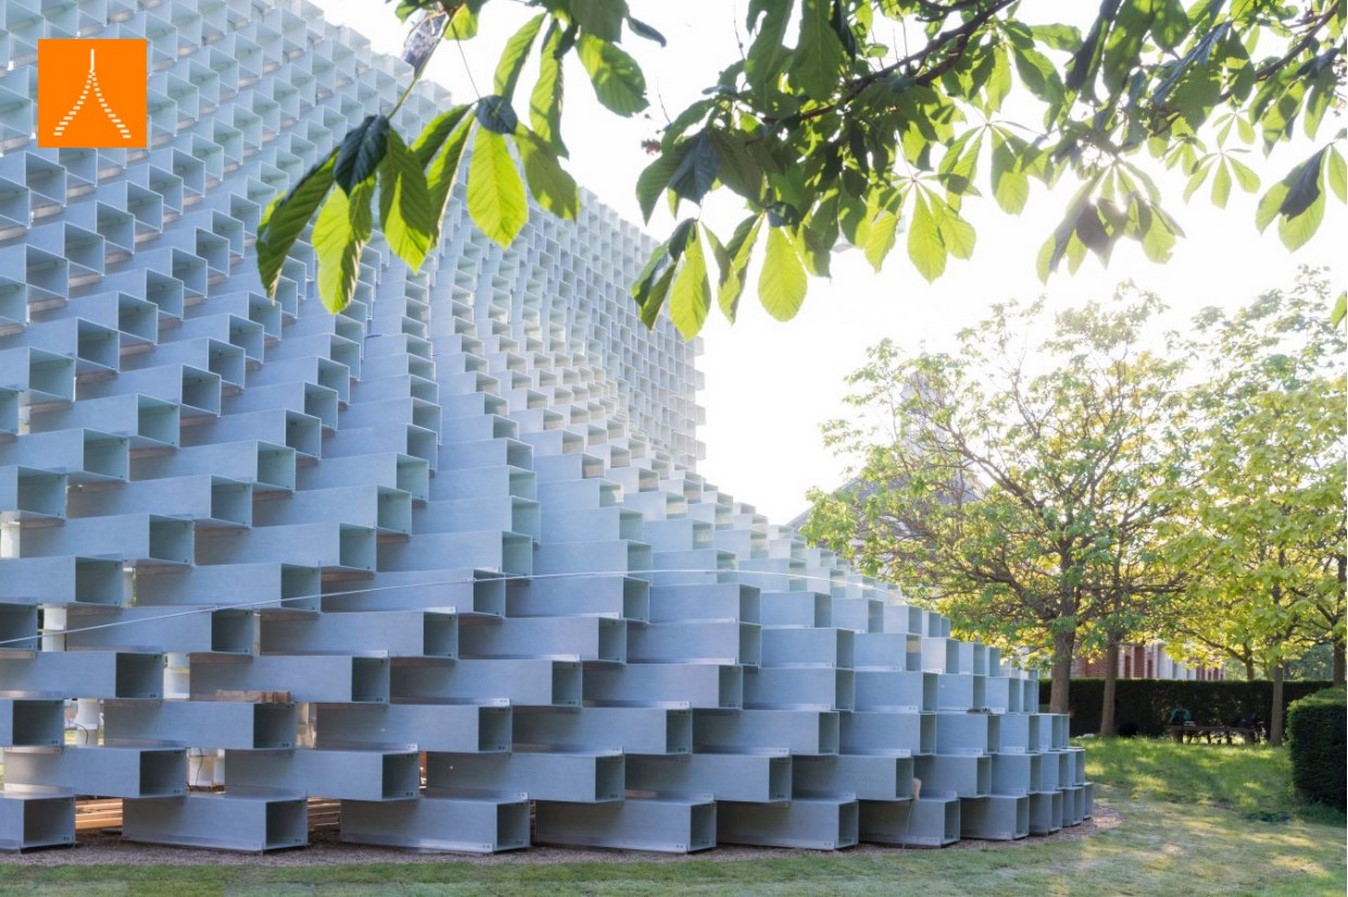 2016 Serpentine Pavilion by BIG: The unzipped walls - Sheet6